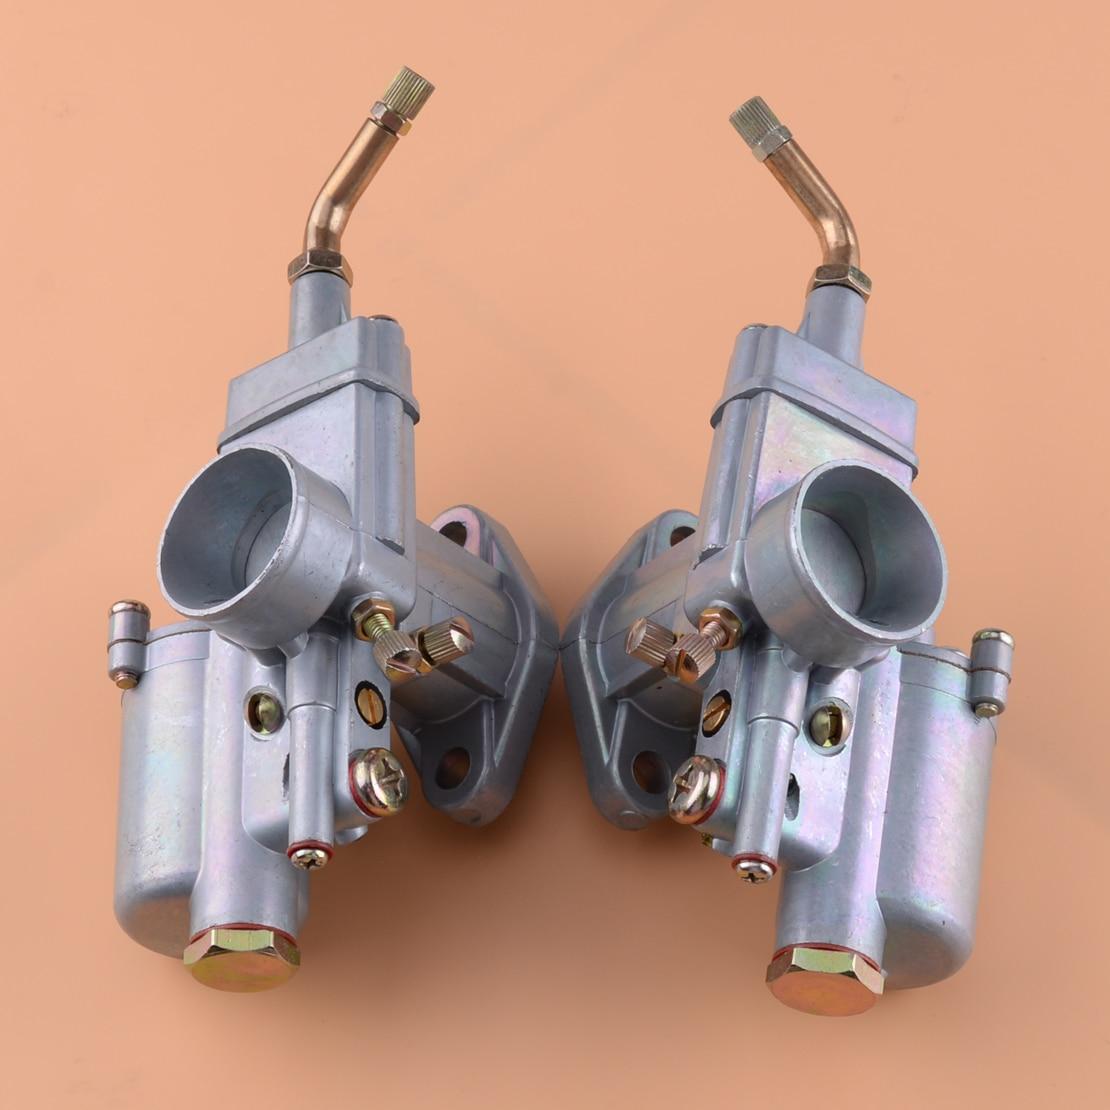 DWCX 1pair 28mm Carb Pair Vergaser Carburettor Carby fit for K302 BMW M72 MT URAL K750